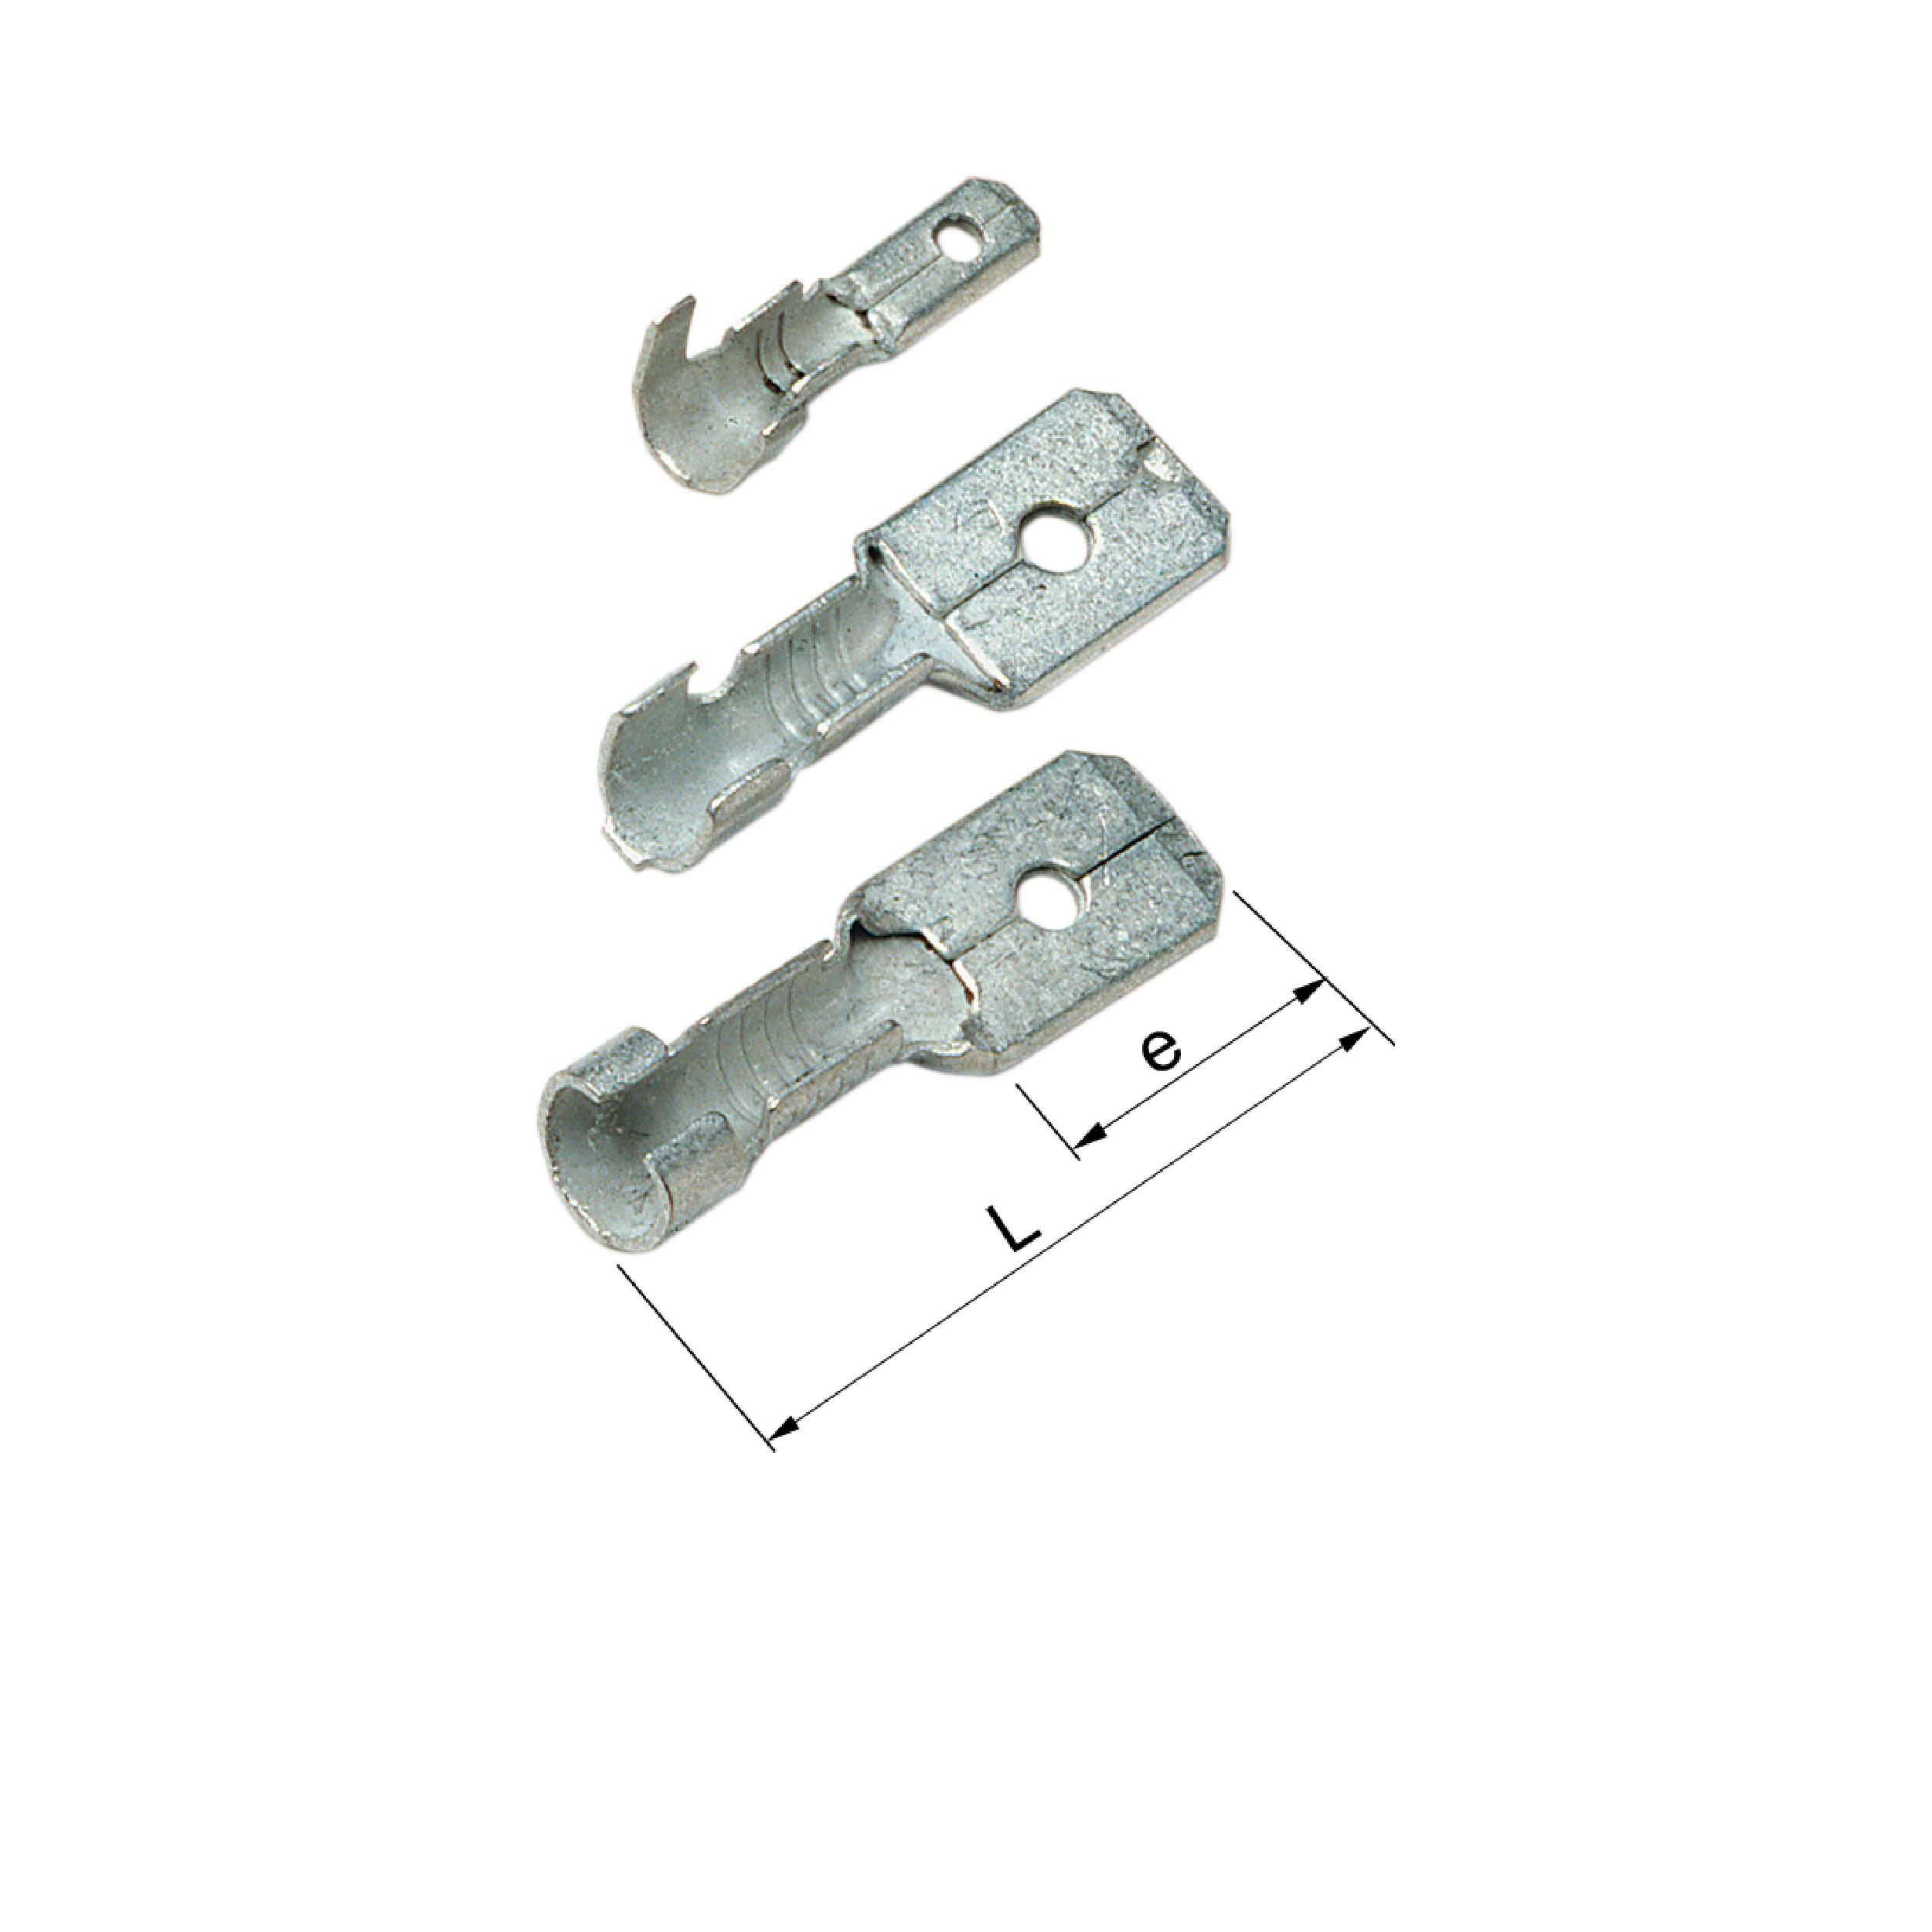 Elpress Un-Insulated Tabs (0.5-2.5mm²). Part Numbers: B1003H, B1507H, B2507H